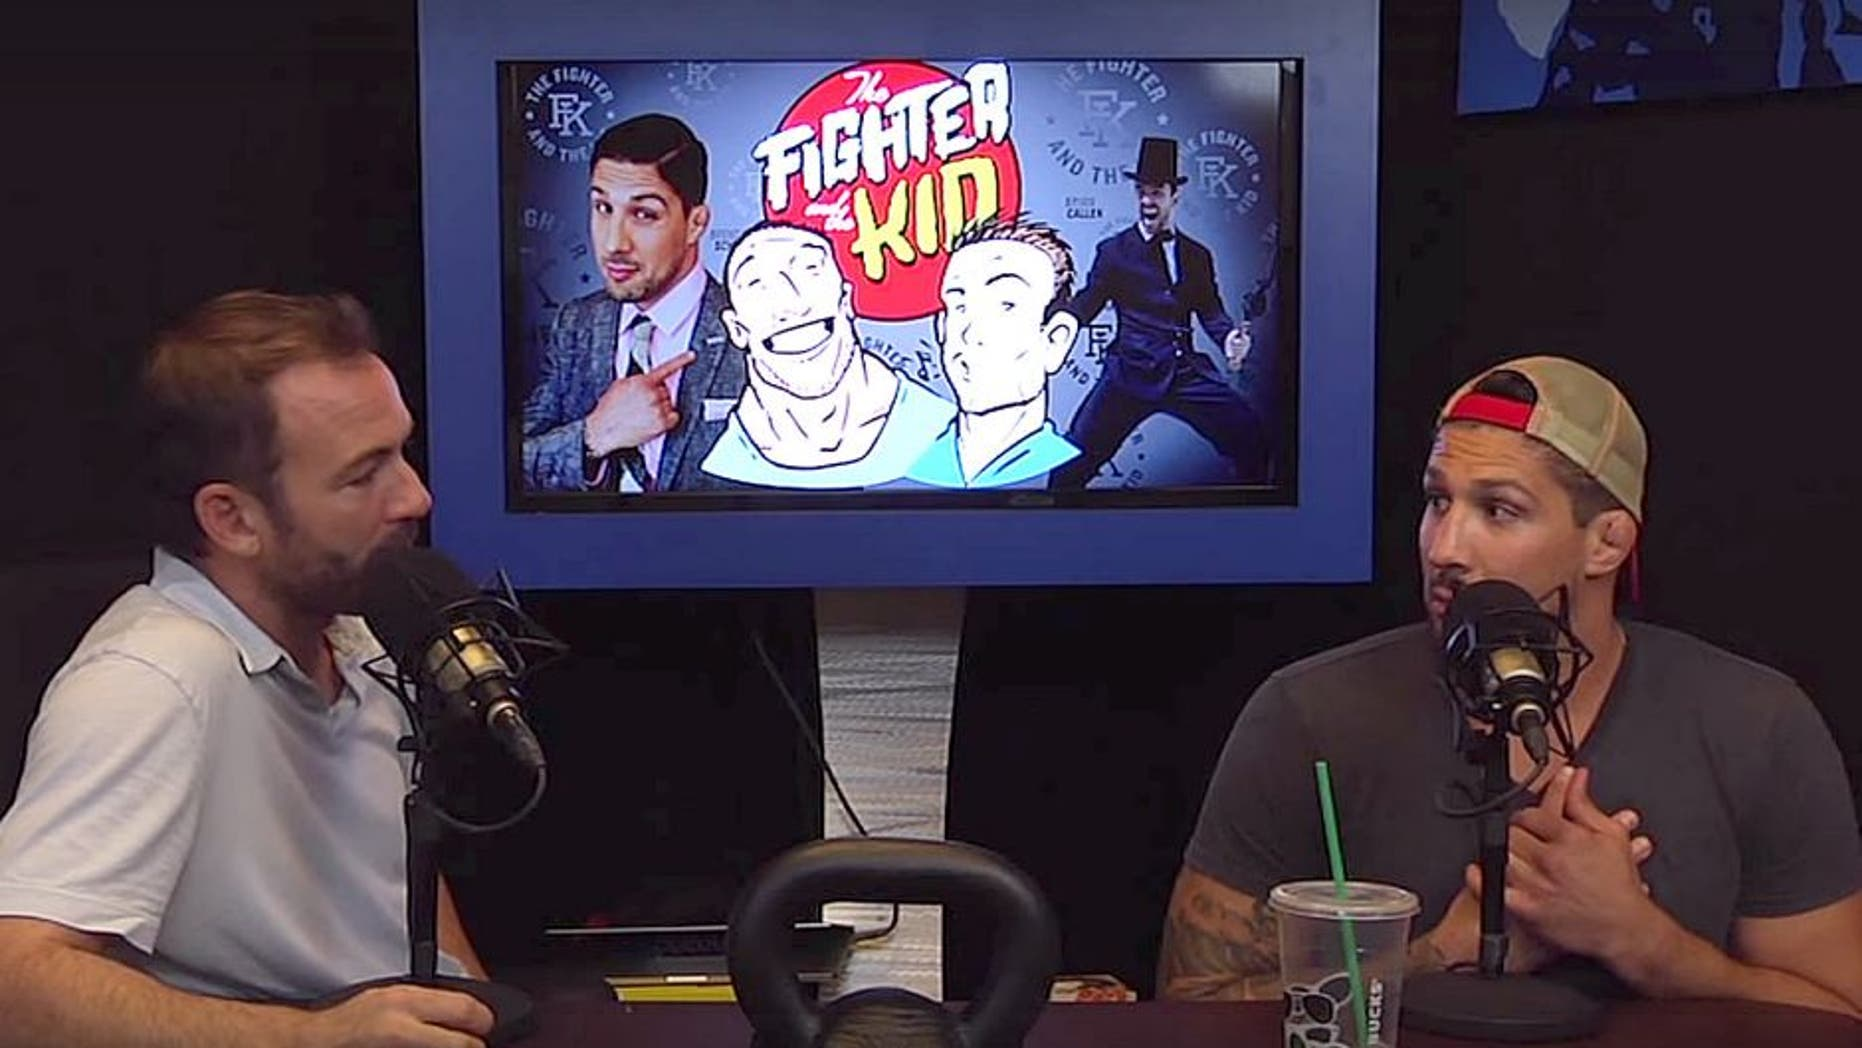 Fighter and the Kid co-hosts Bryan Callen and Brendan Schaub